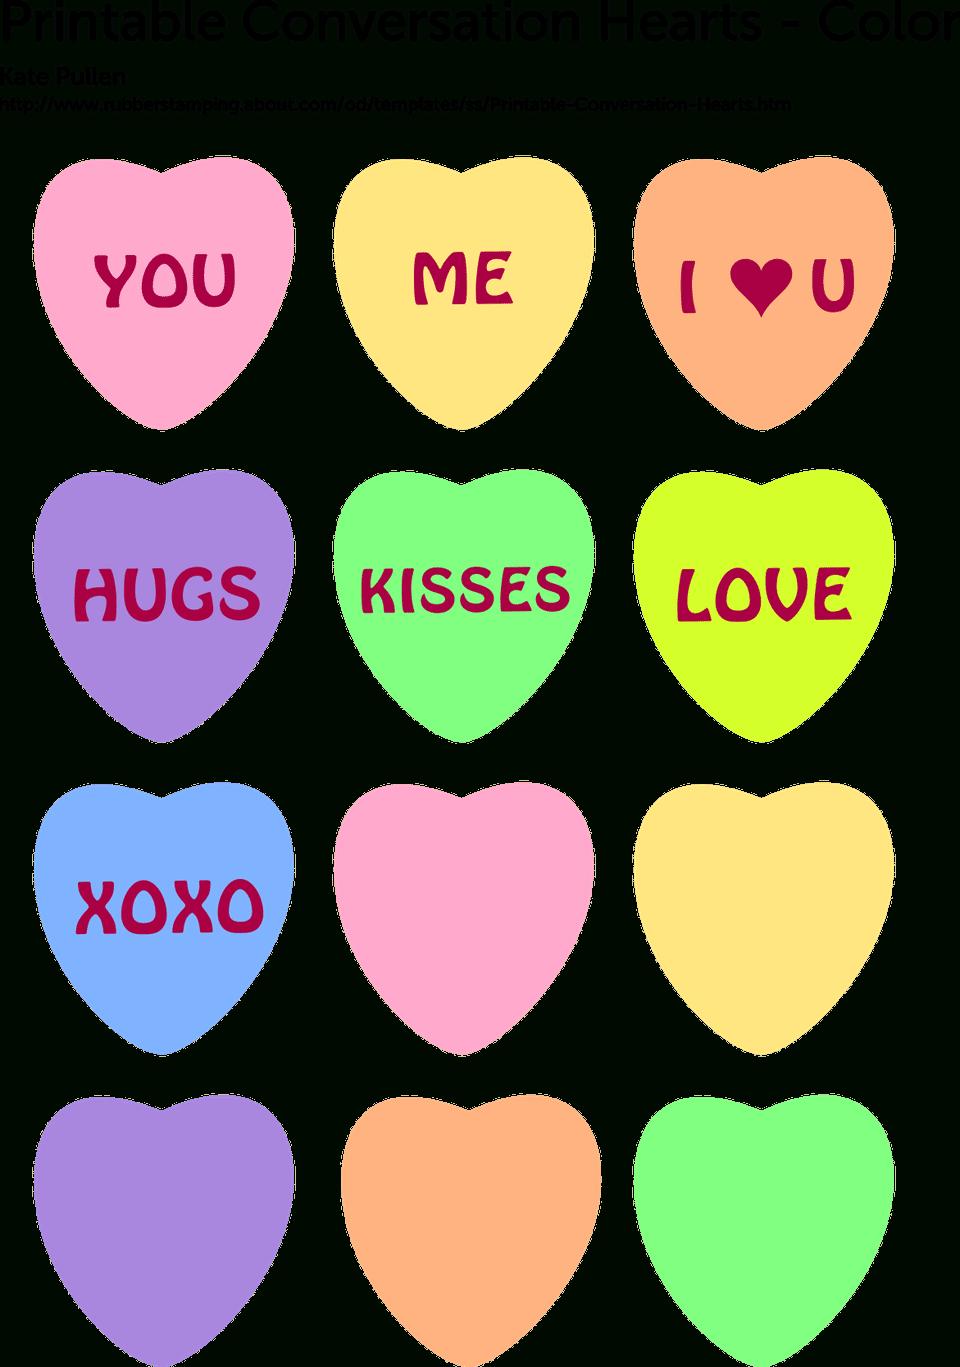 6 Free Printable Heart Templates   Valentine Ideas   Pinterest - Free Printable Valentine's Day Stencils